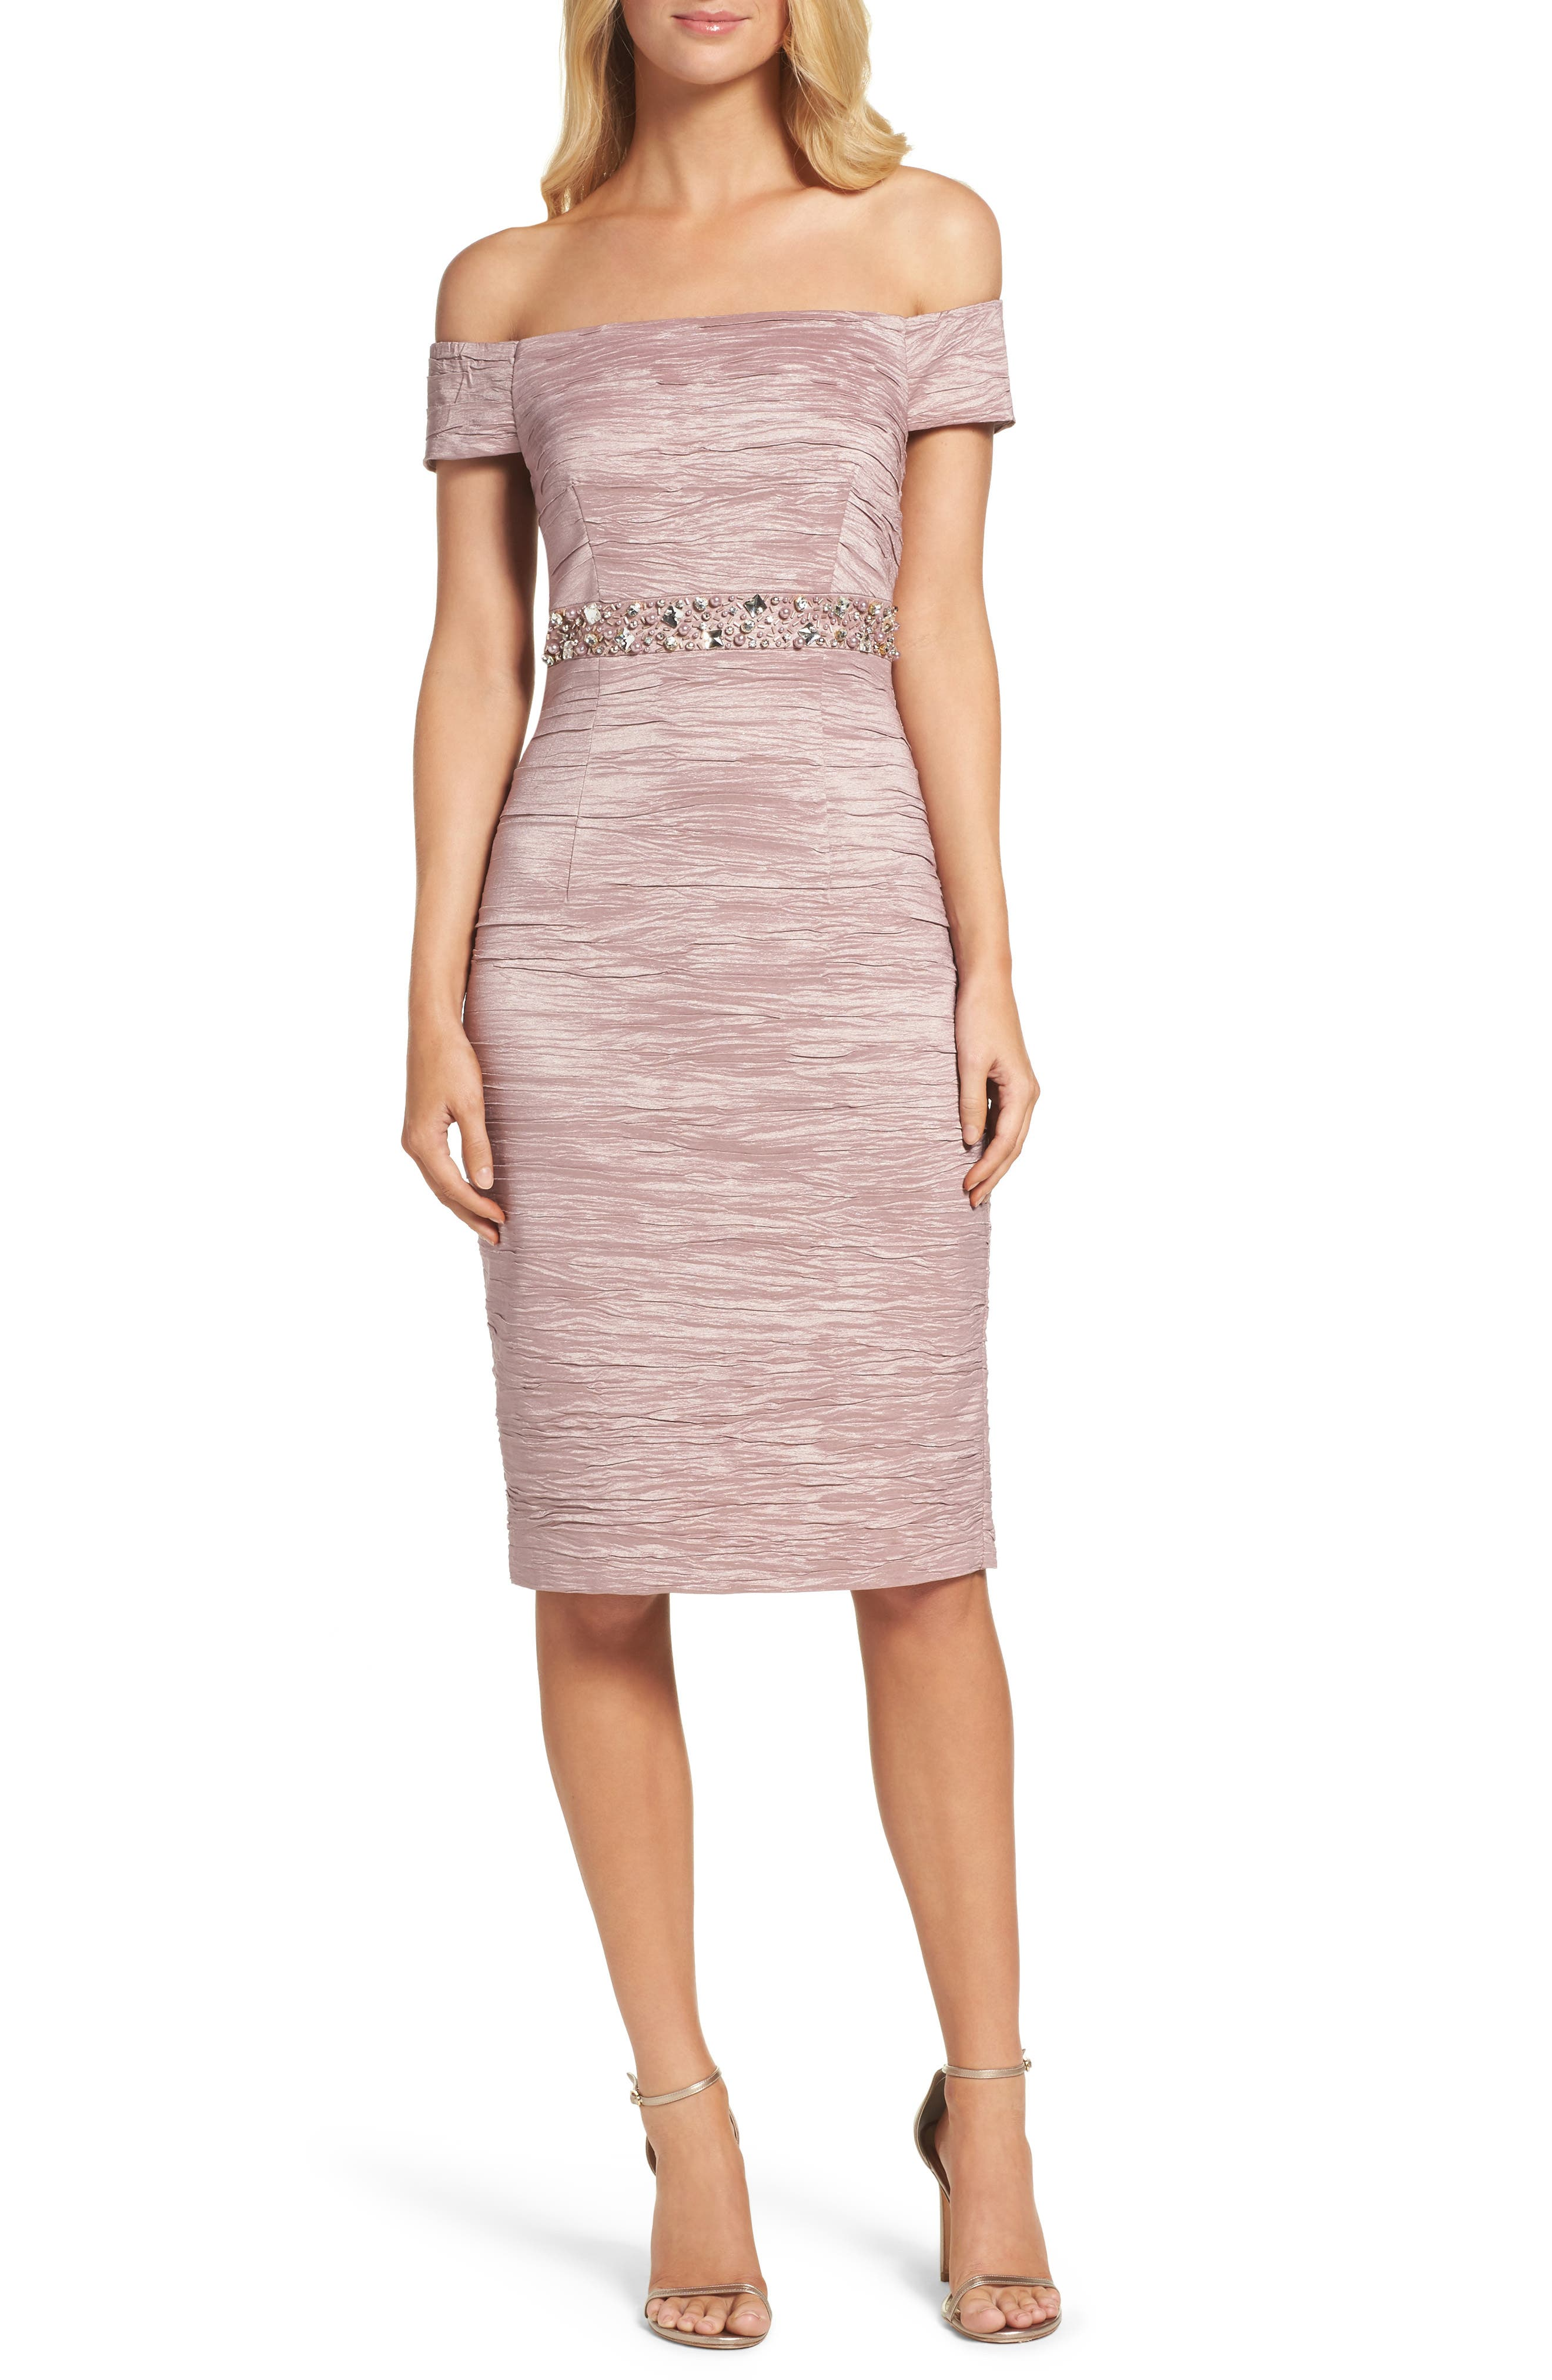 Alternate Image 1 Selected - Eliza J Off the Shoulder Taffeta Dress (Regular & Petite)